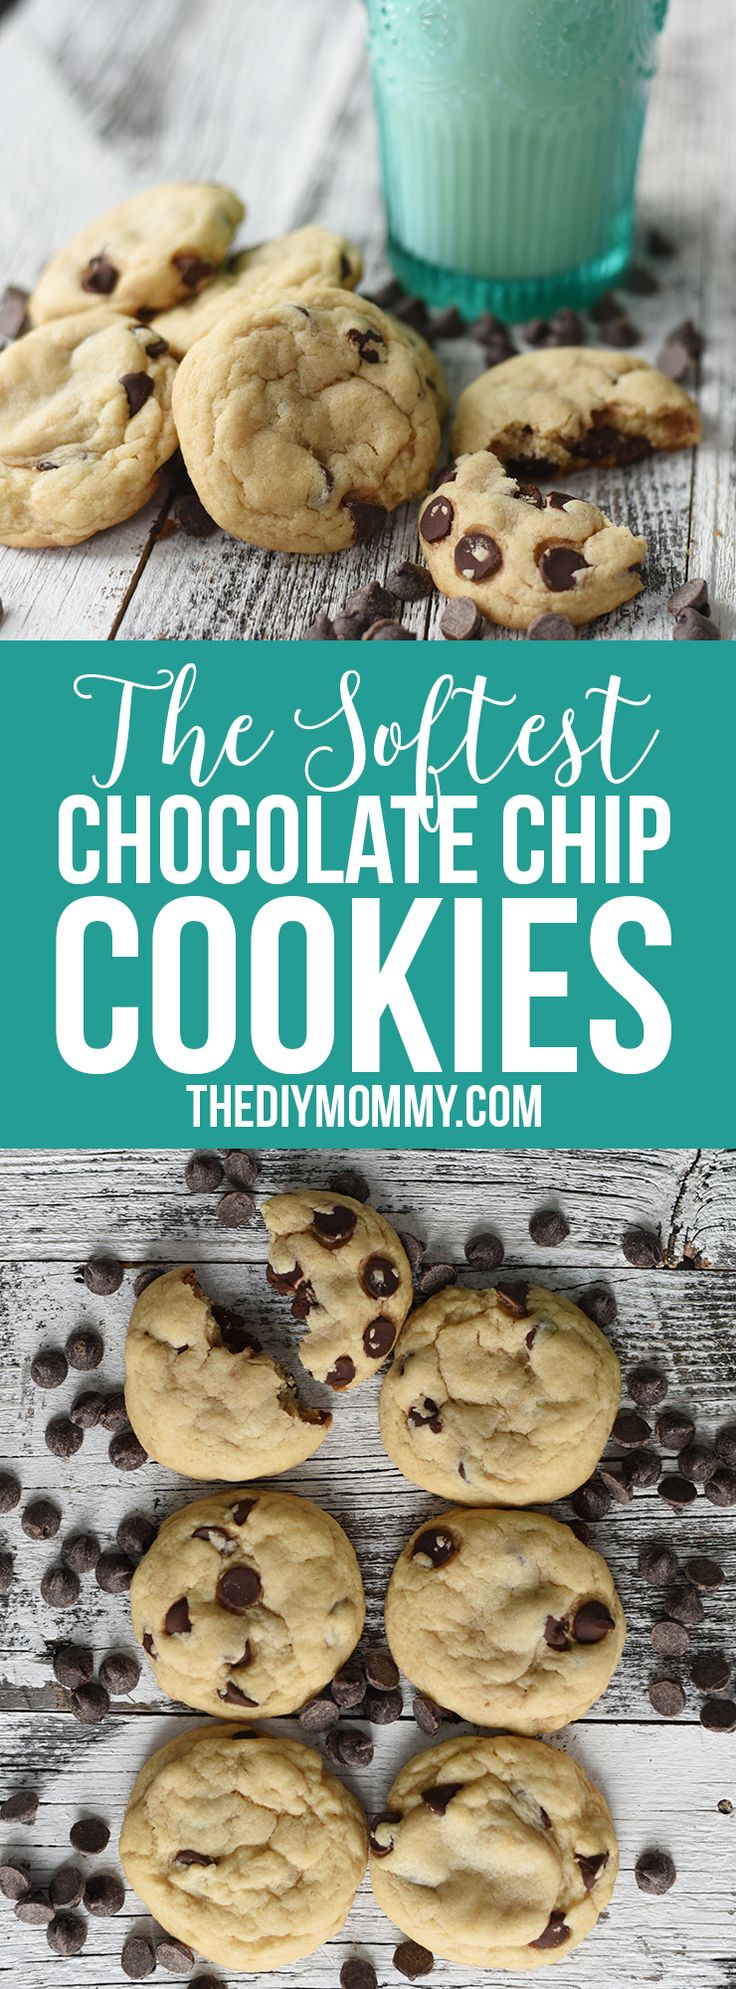 6435 best Dessert & Sweets images on Pinterest | Petit fours ...